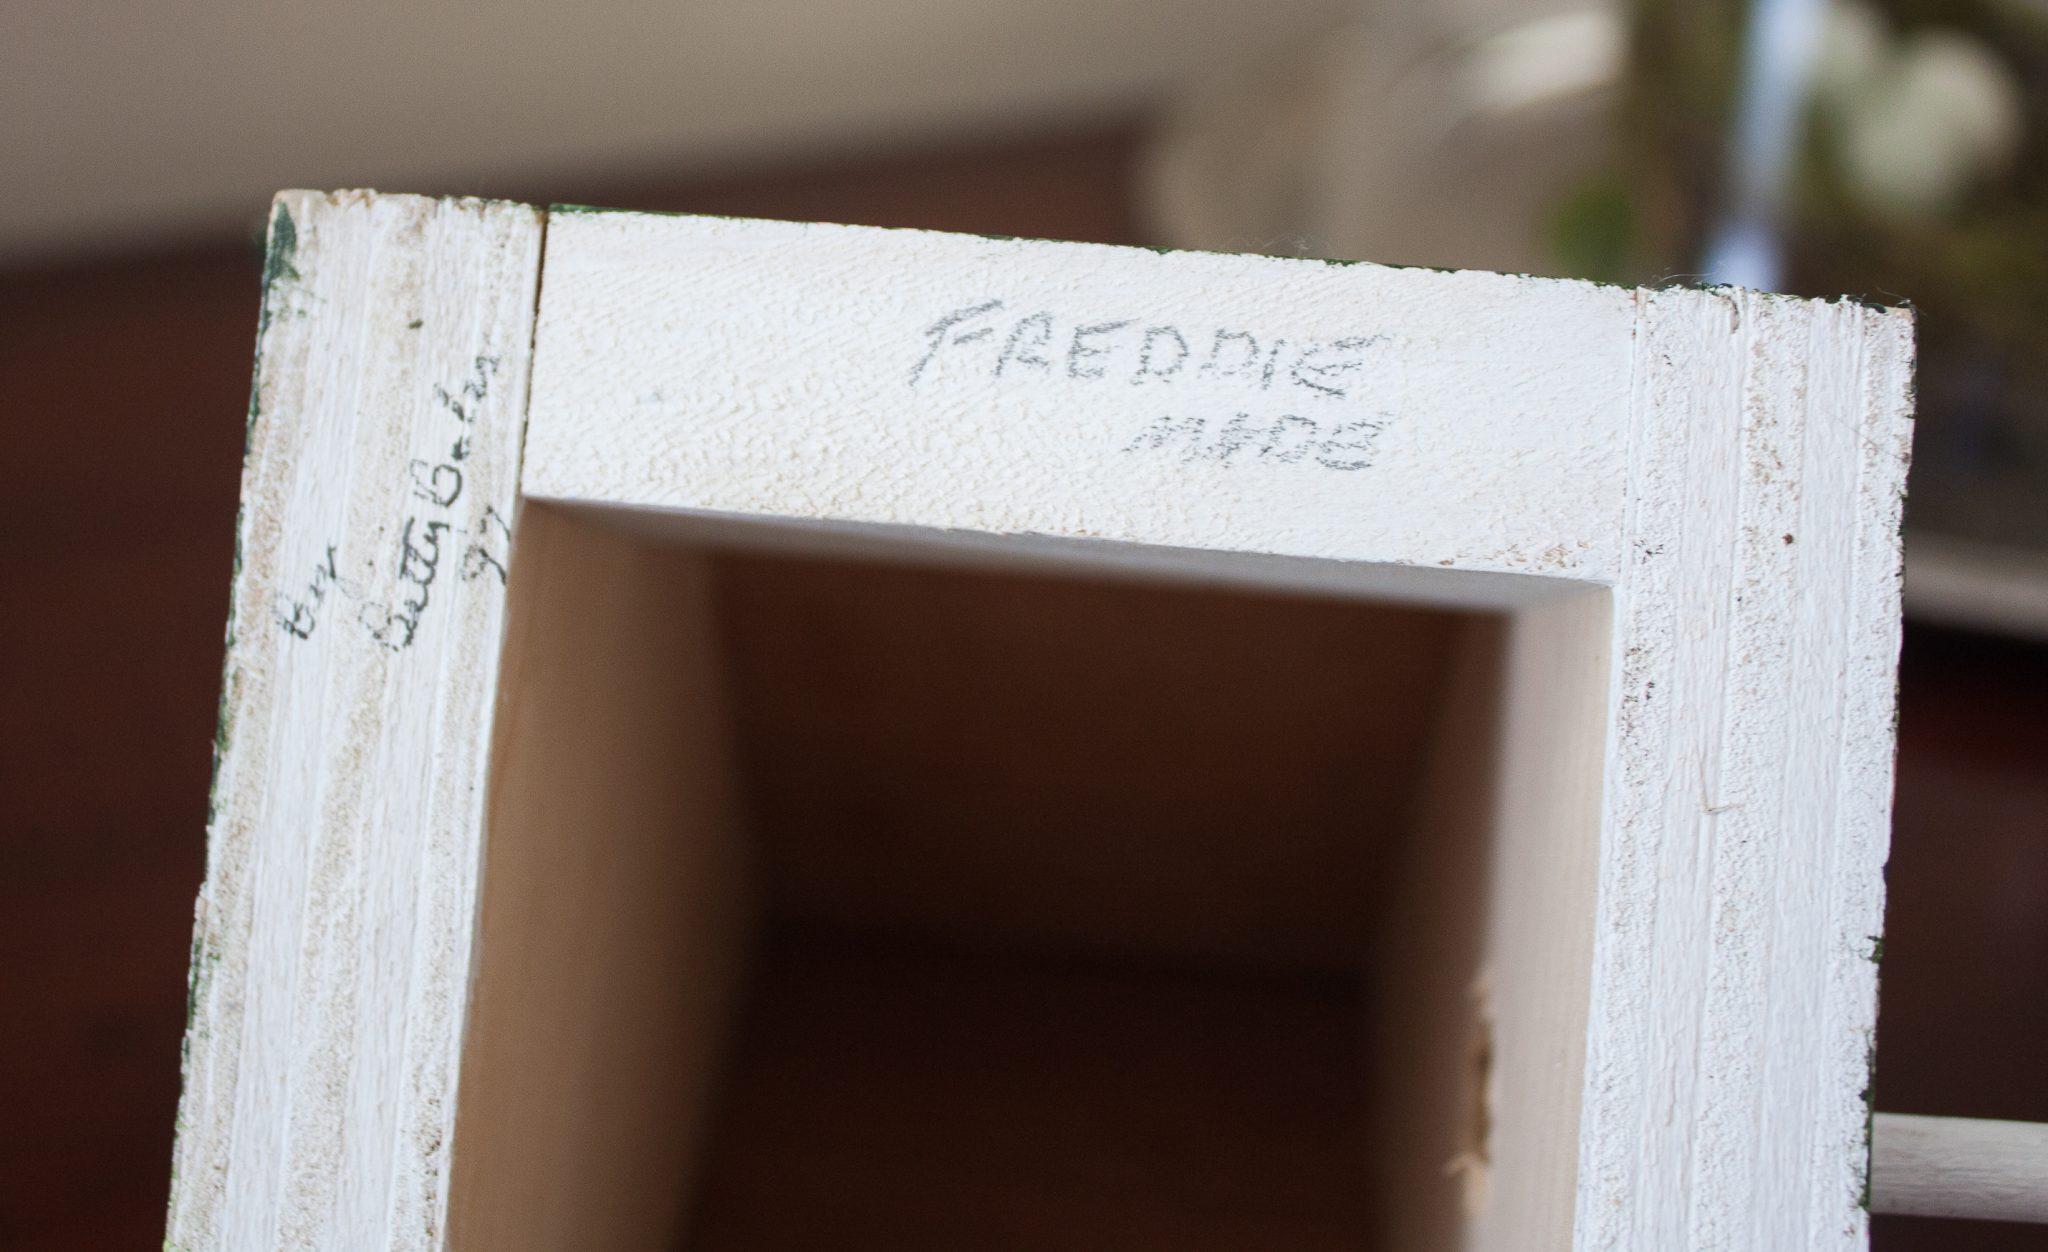 Writing on the bottom of a handmade birdhouse